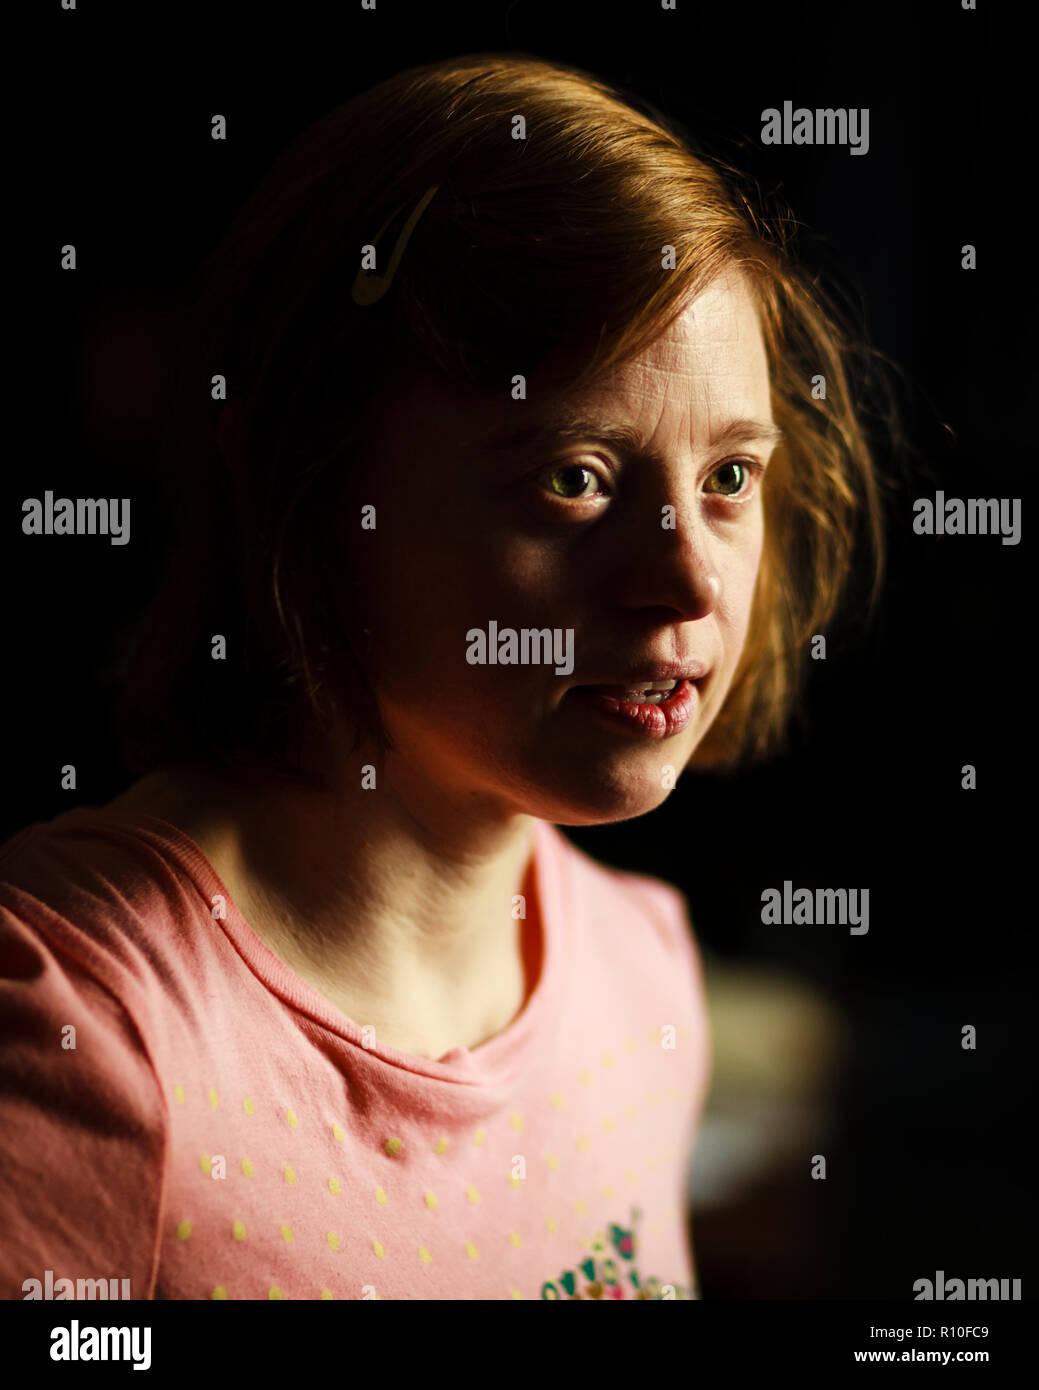 Sarah Gordy (born 1978)